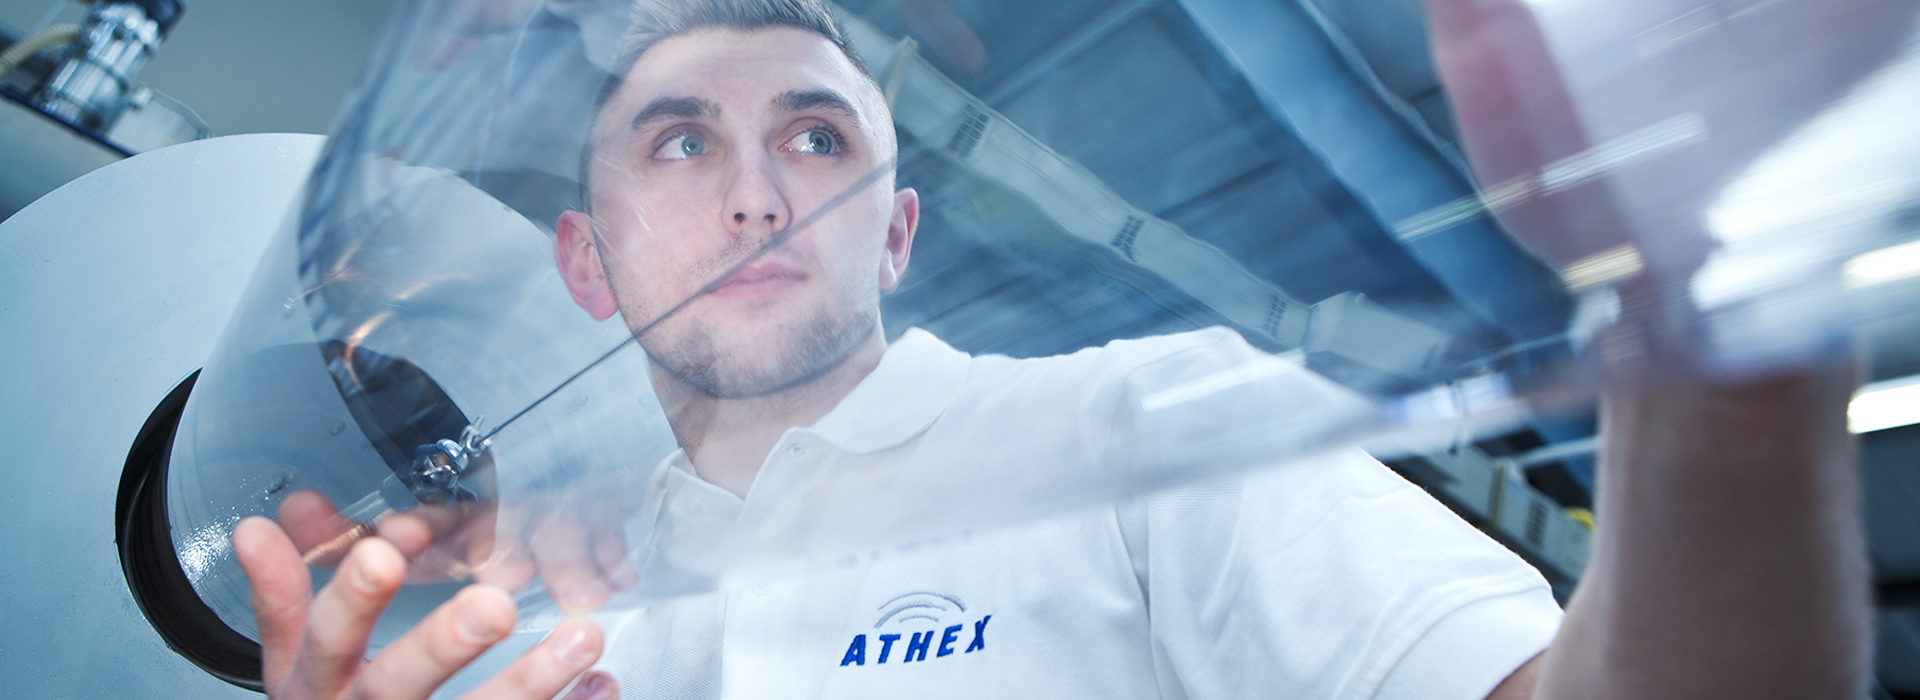 Rohrextrusion, transparentes Rohr, ATHEX Mitarbeiter